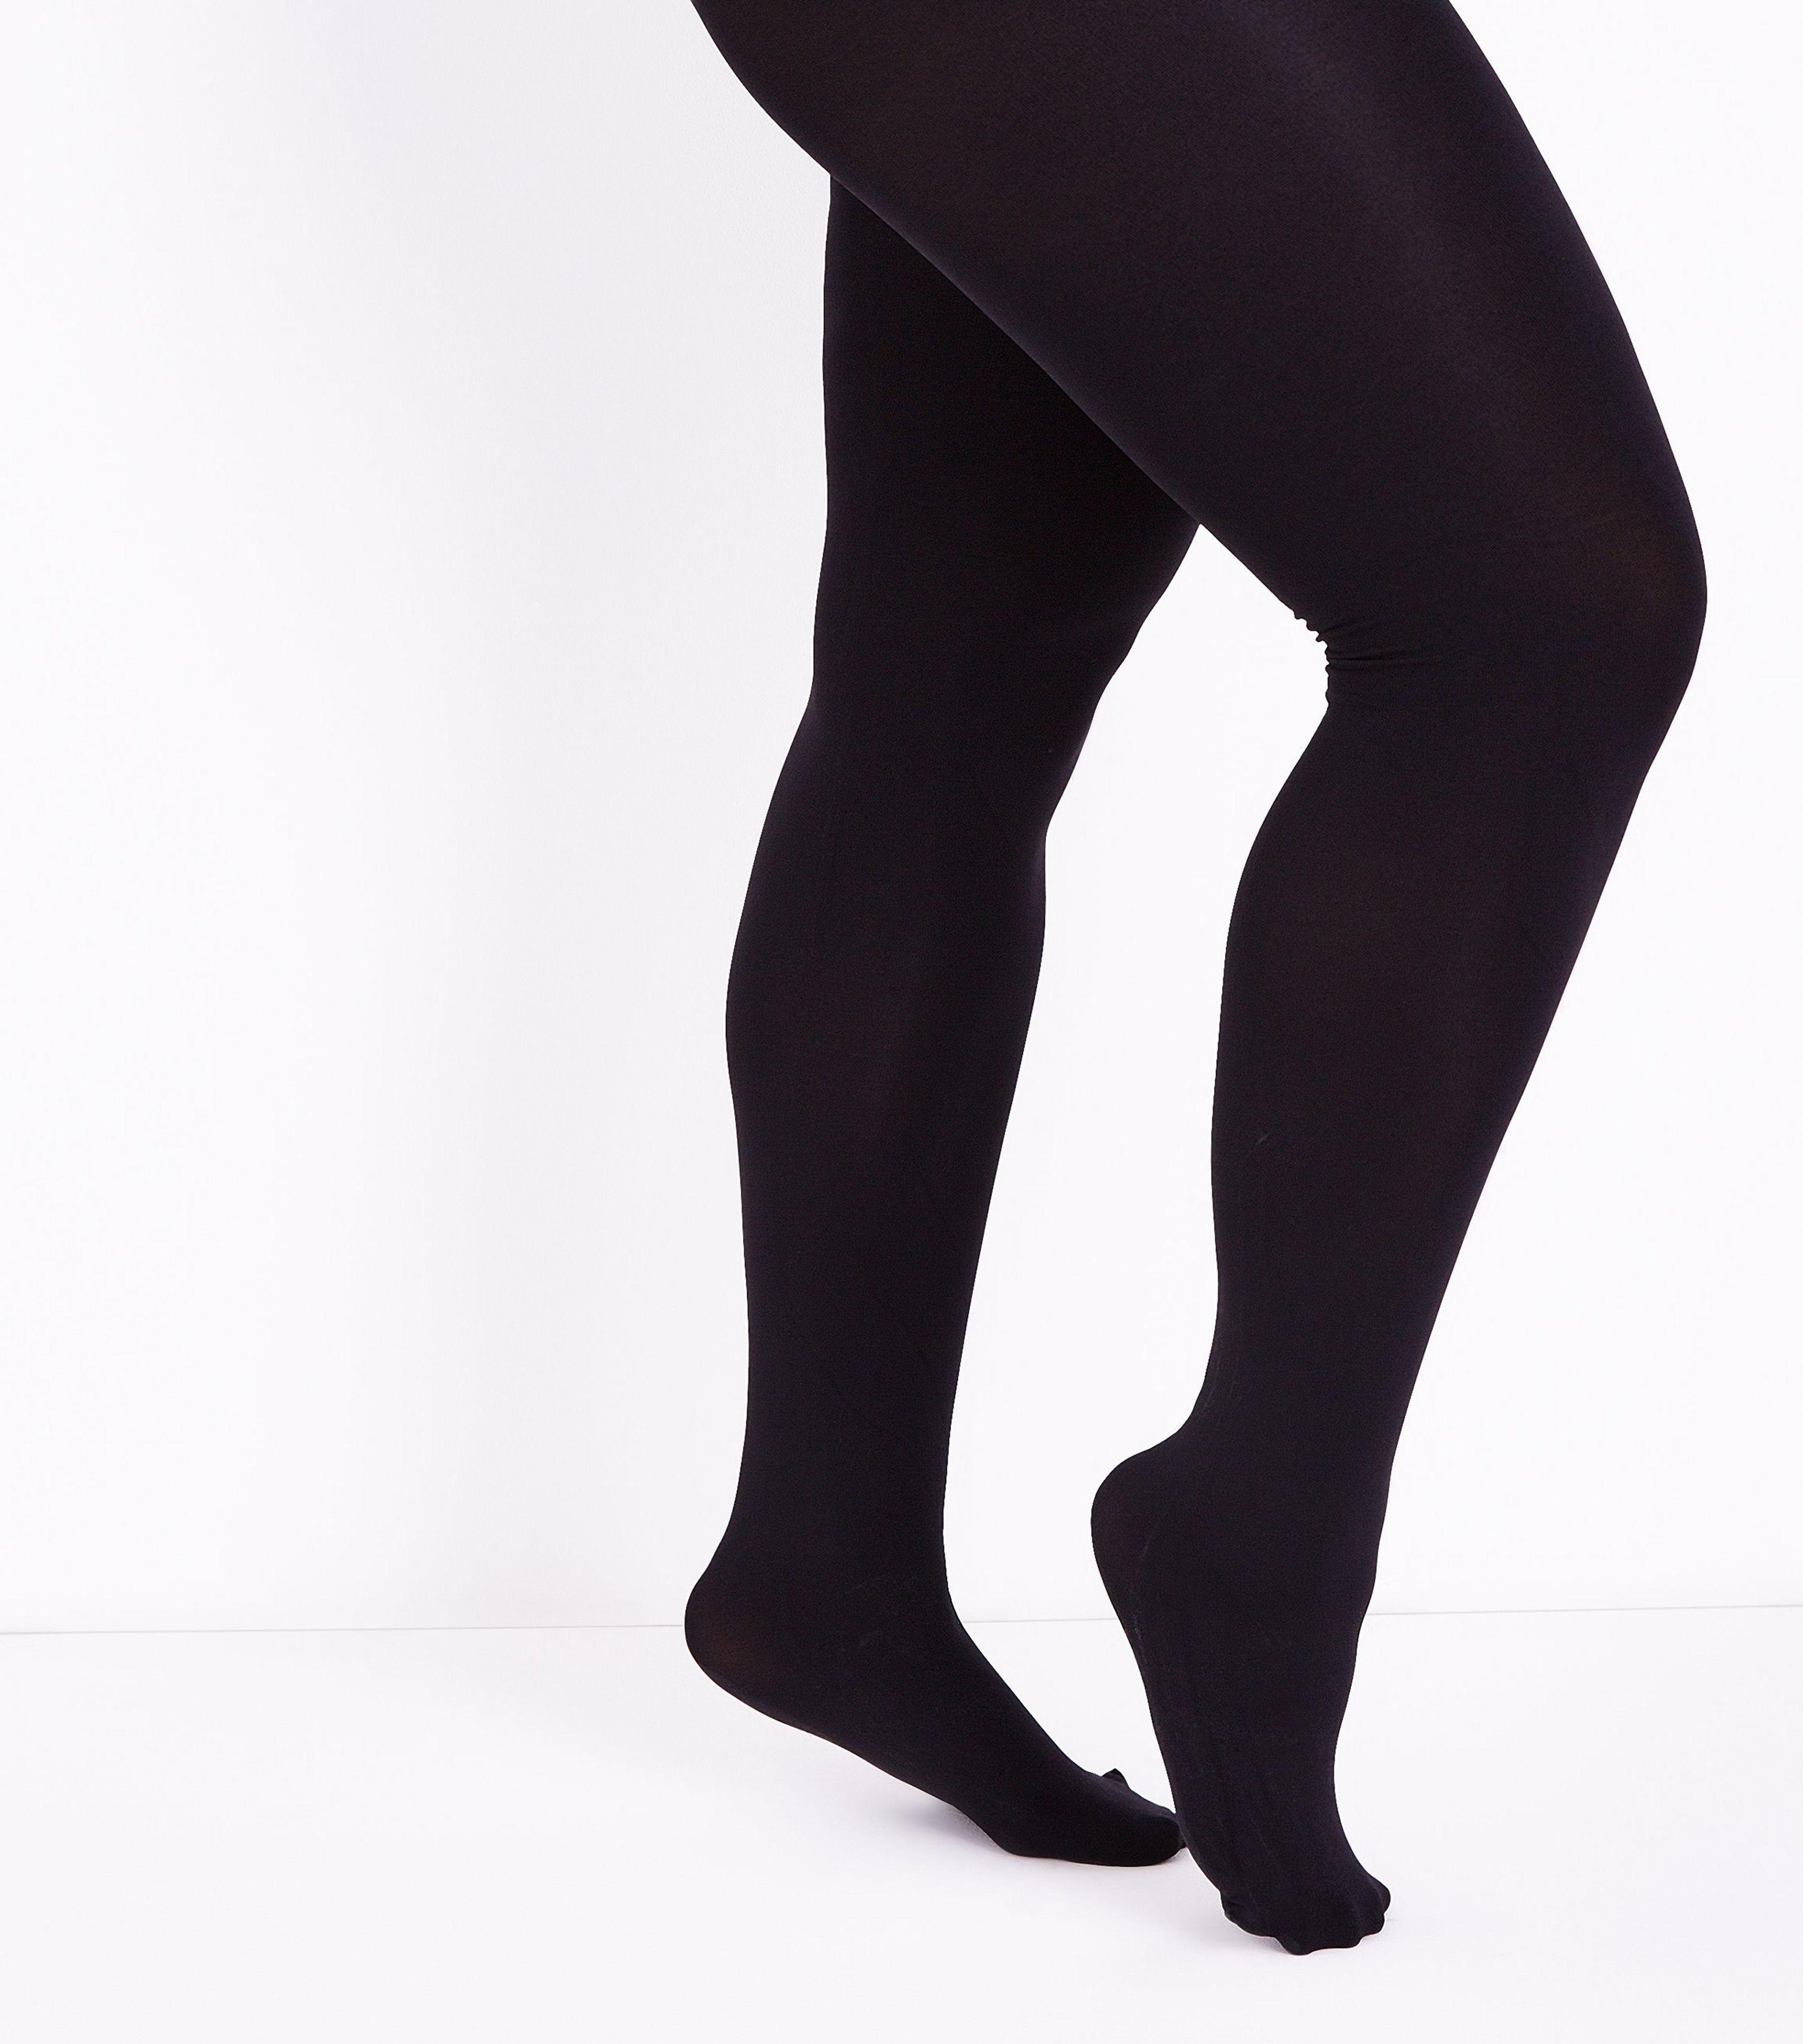 447858ad153f4 New Look Curves Black 200 Denier Tights in Black - Save 60% - Lyst